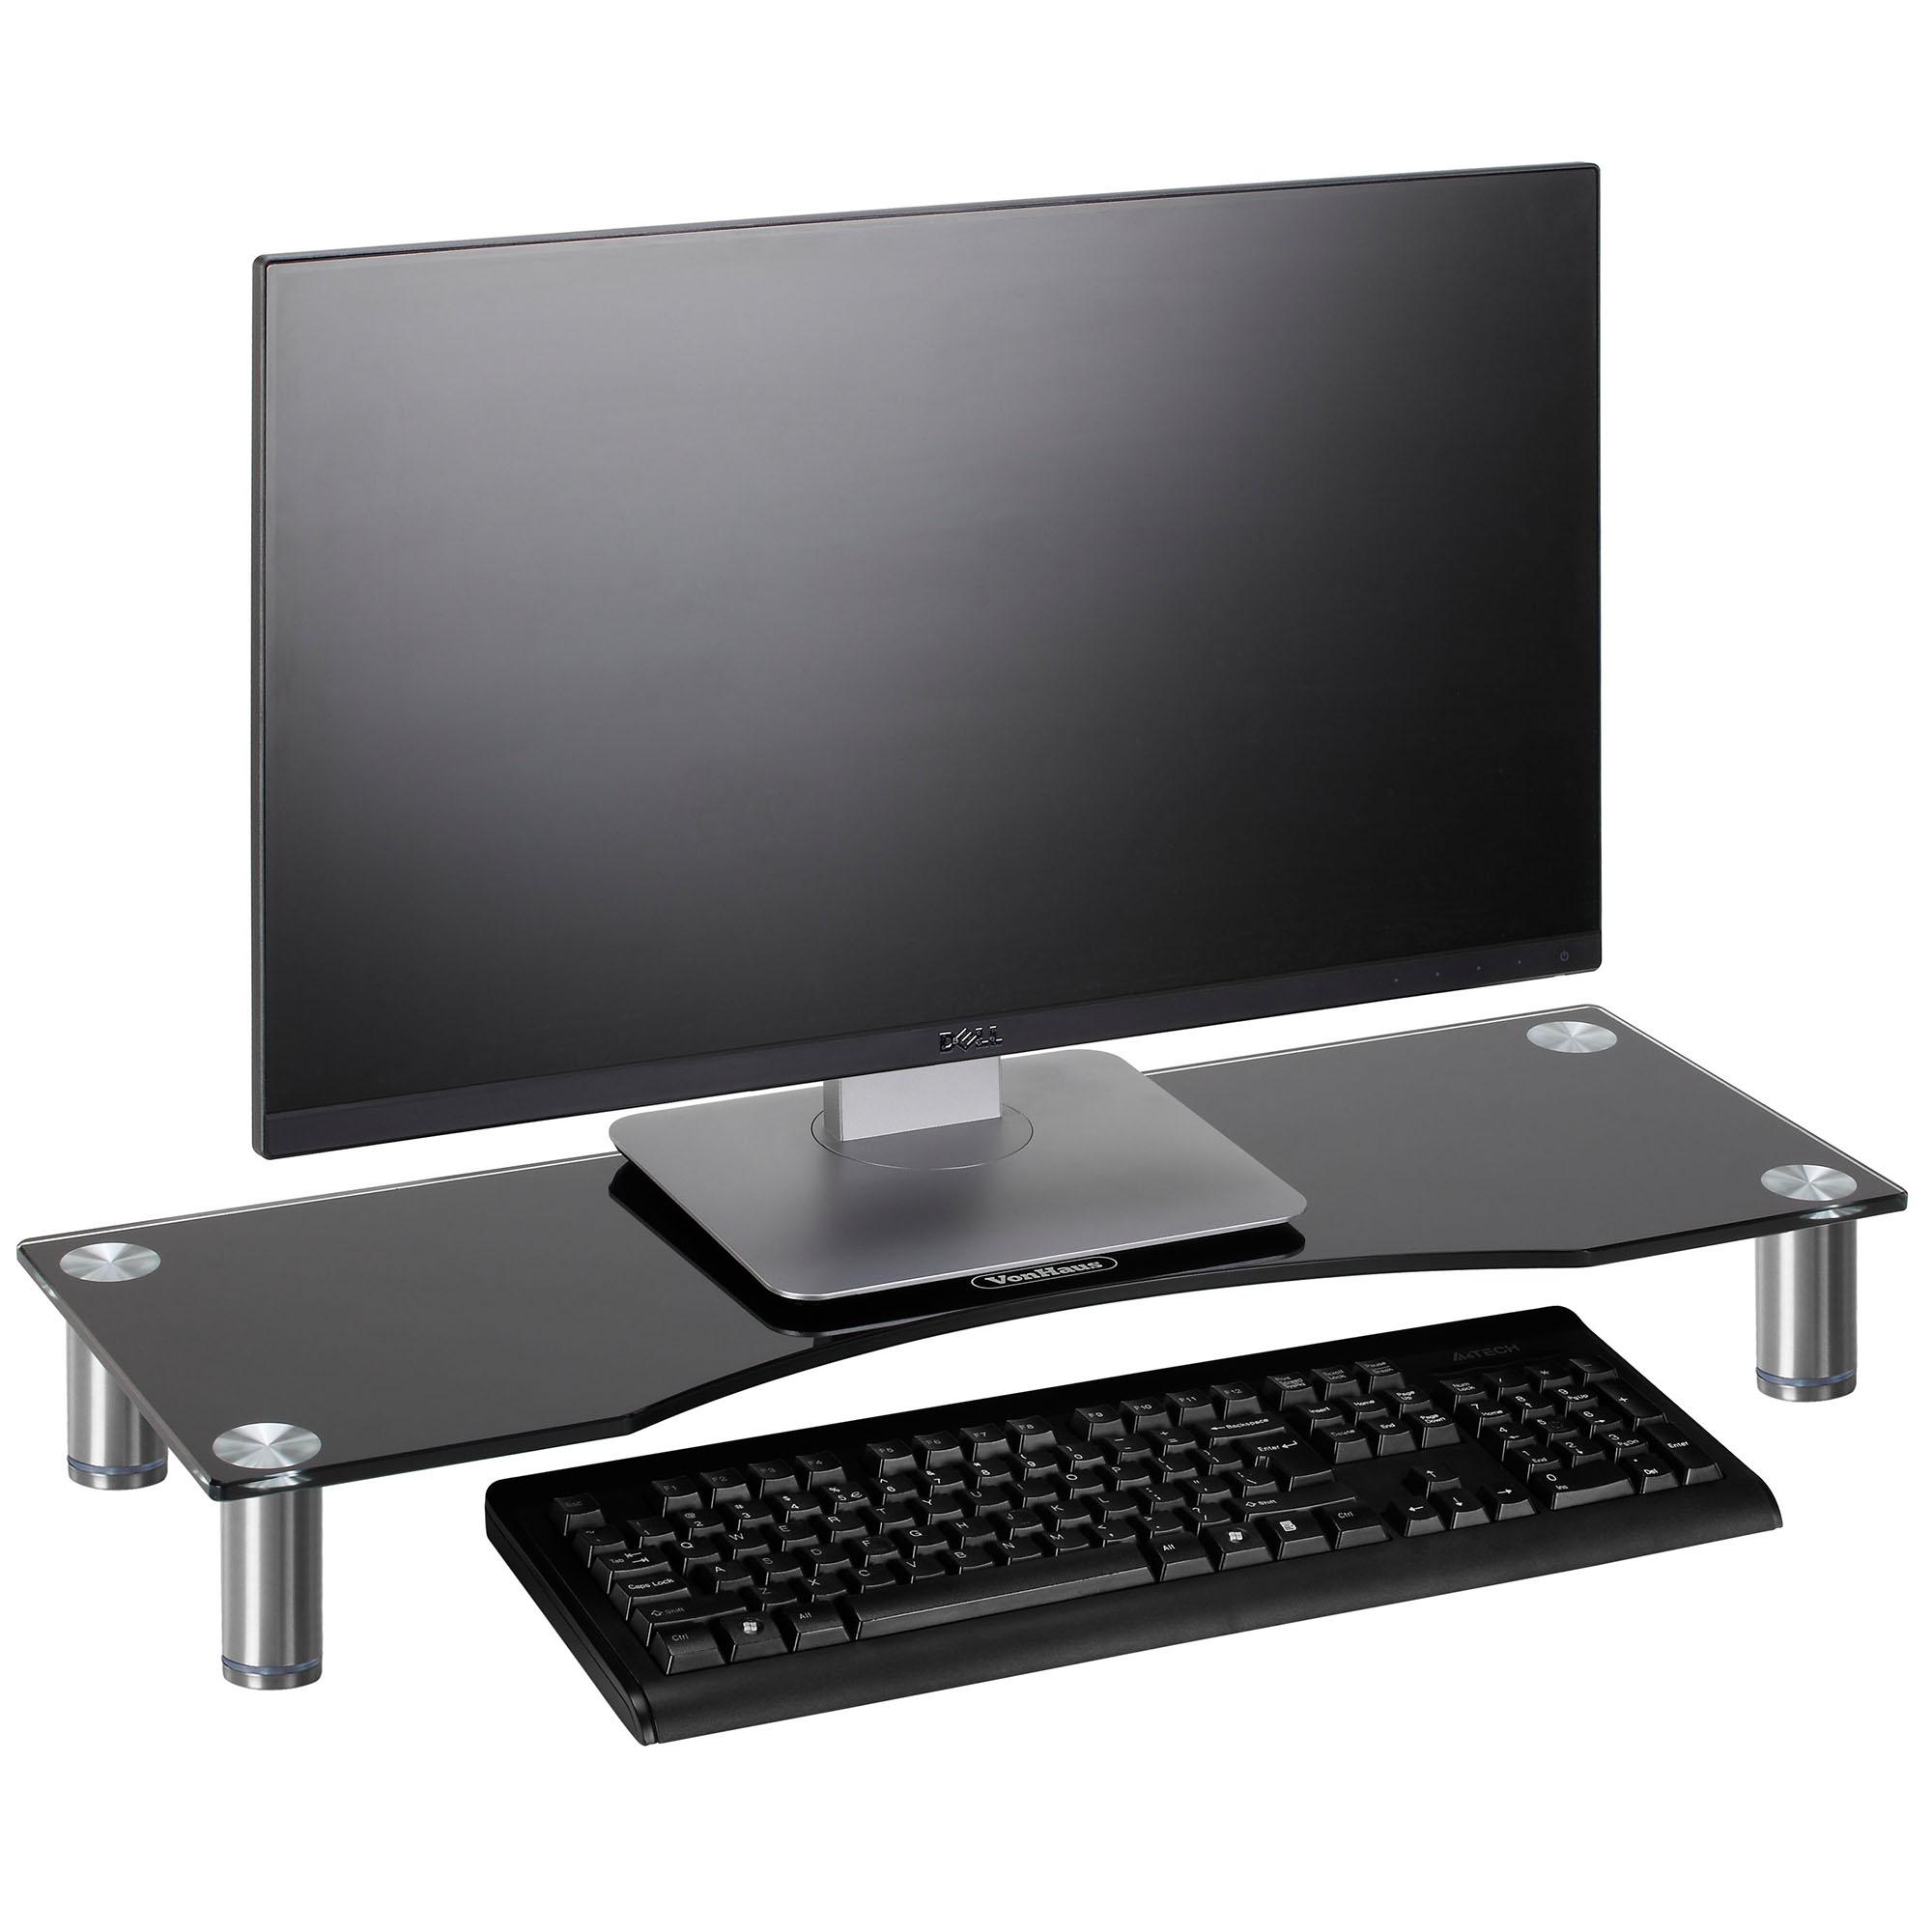 Vonhaus Large Black Curved Glass Monitor Mount Tv Display